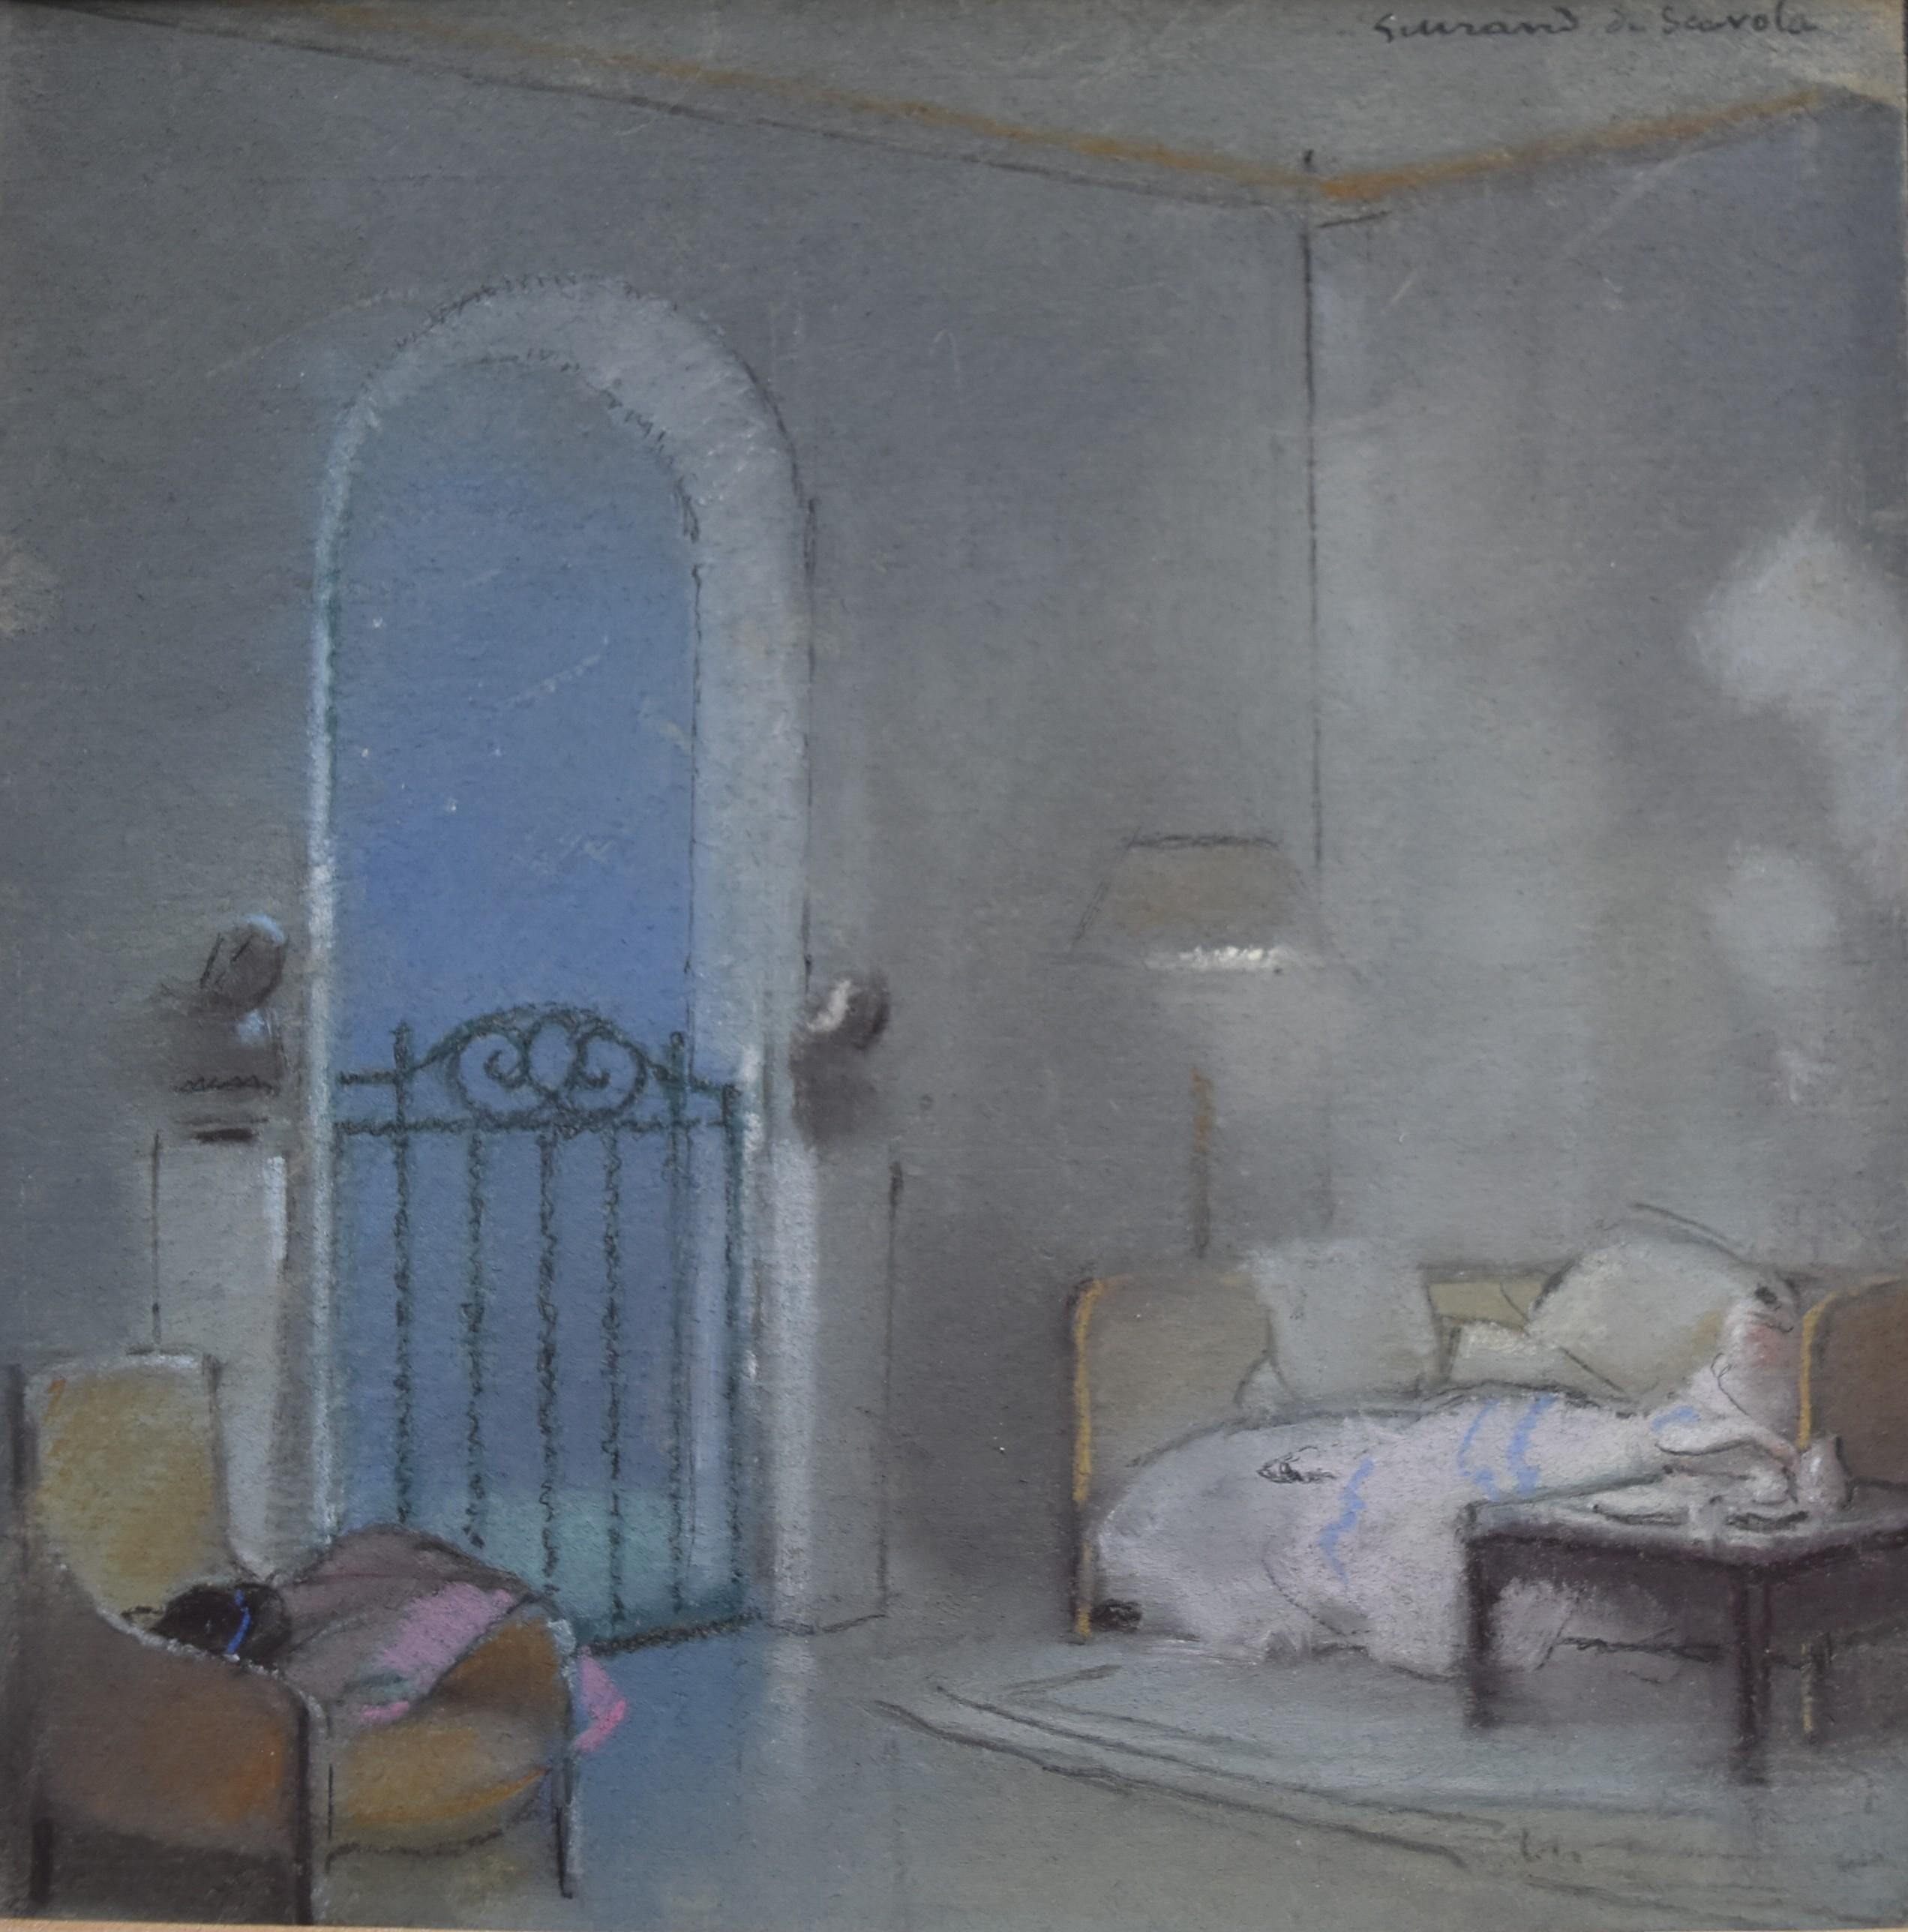 Guirand de Scevola  (1871-1950) A view of an interior, pastel